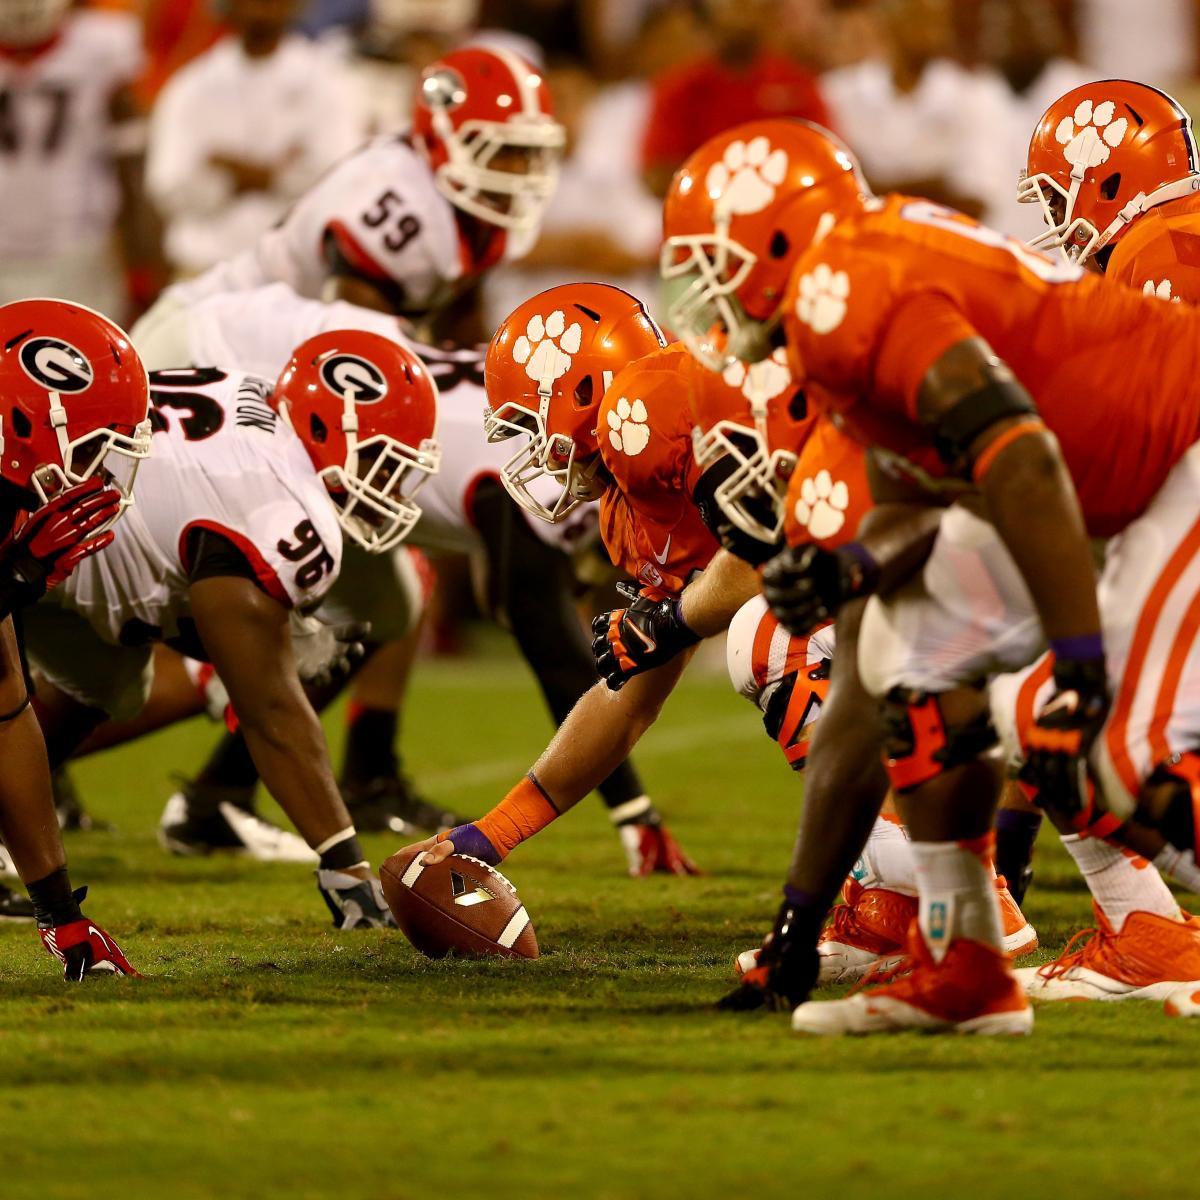 football rivalry clemson college vs georgia highlights videos latest